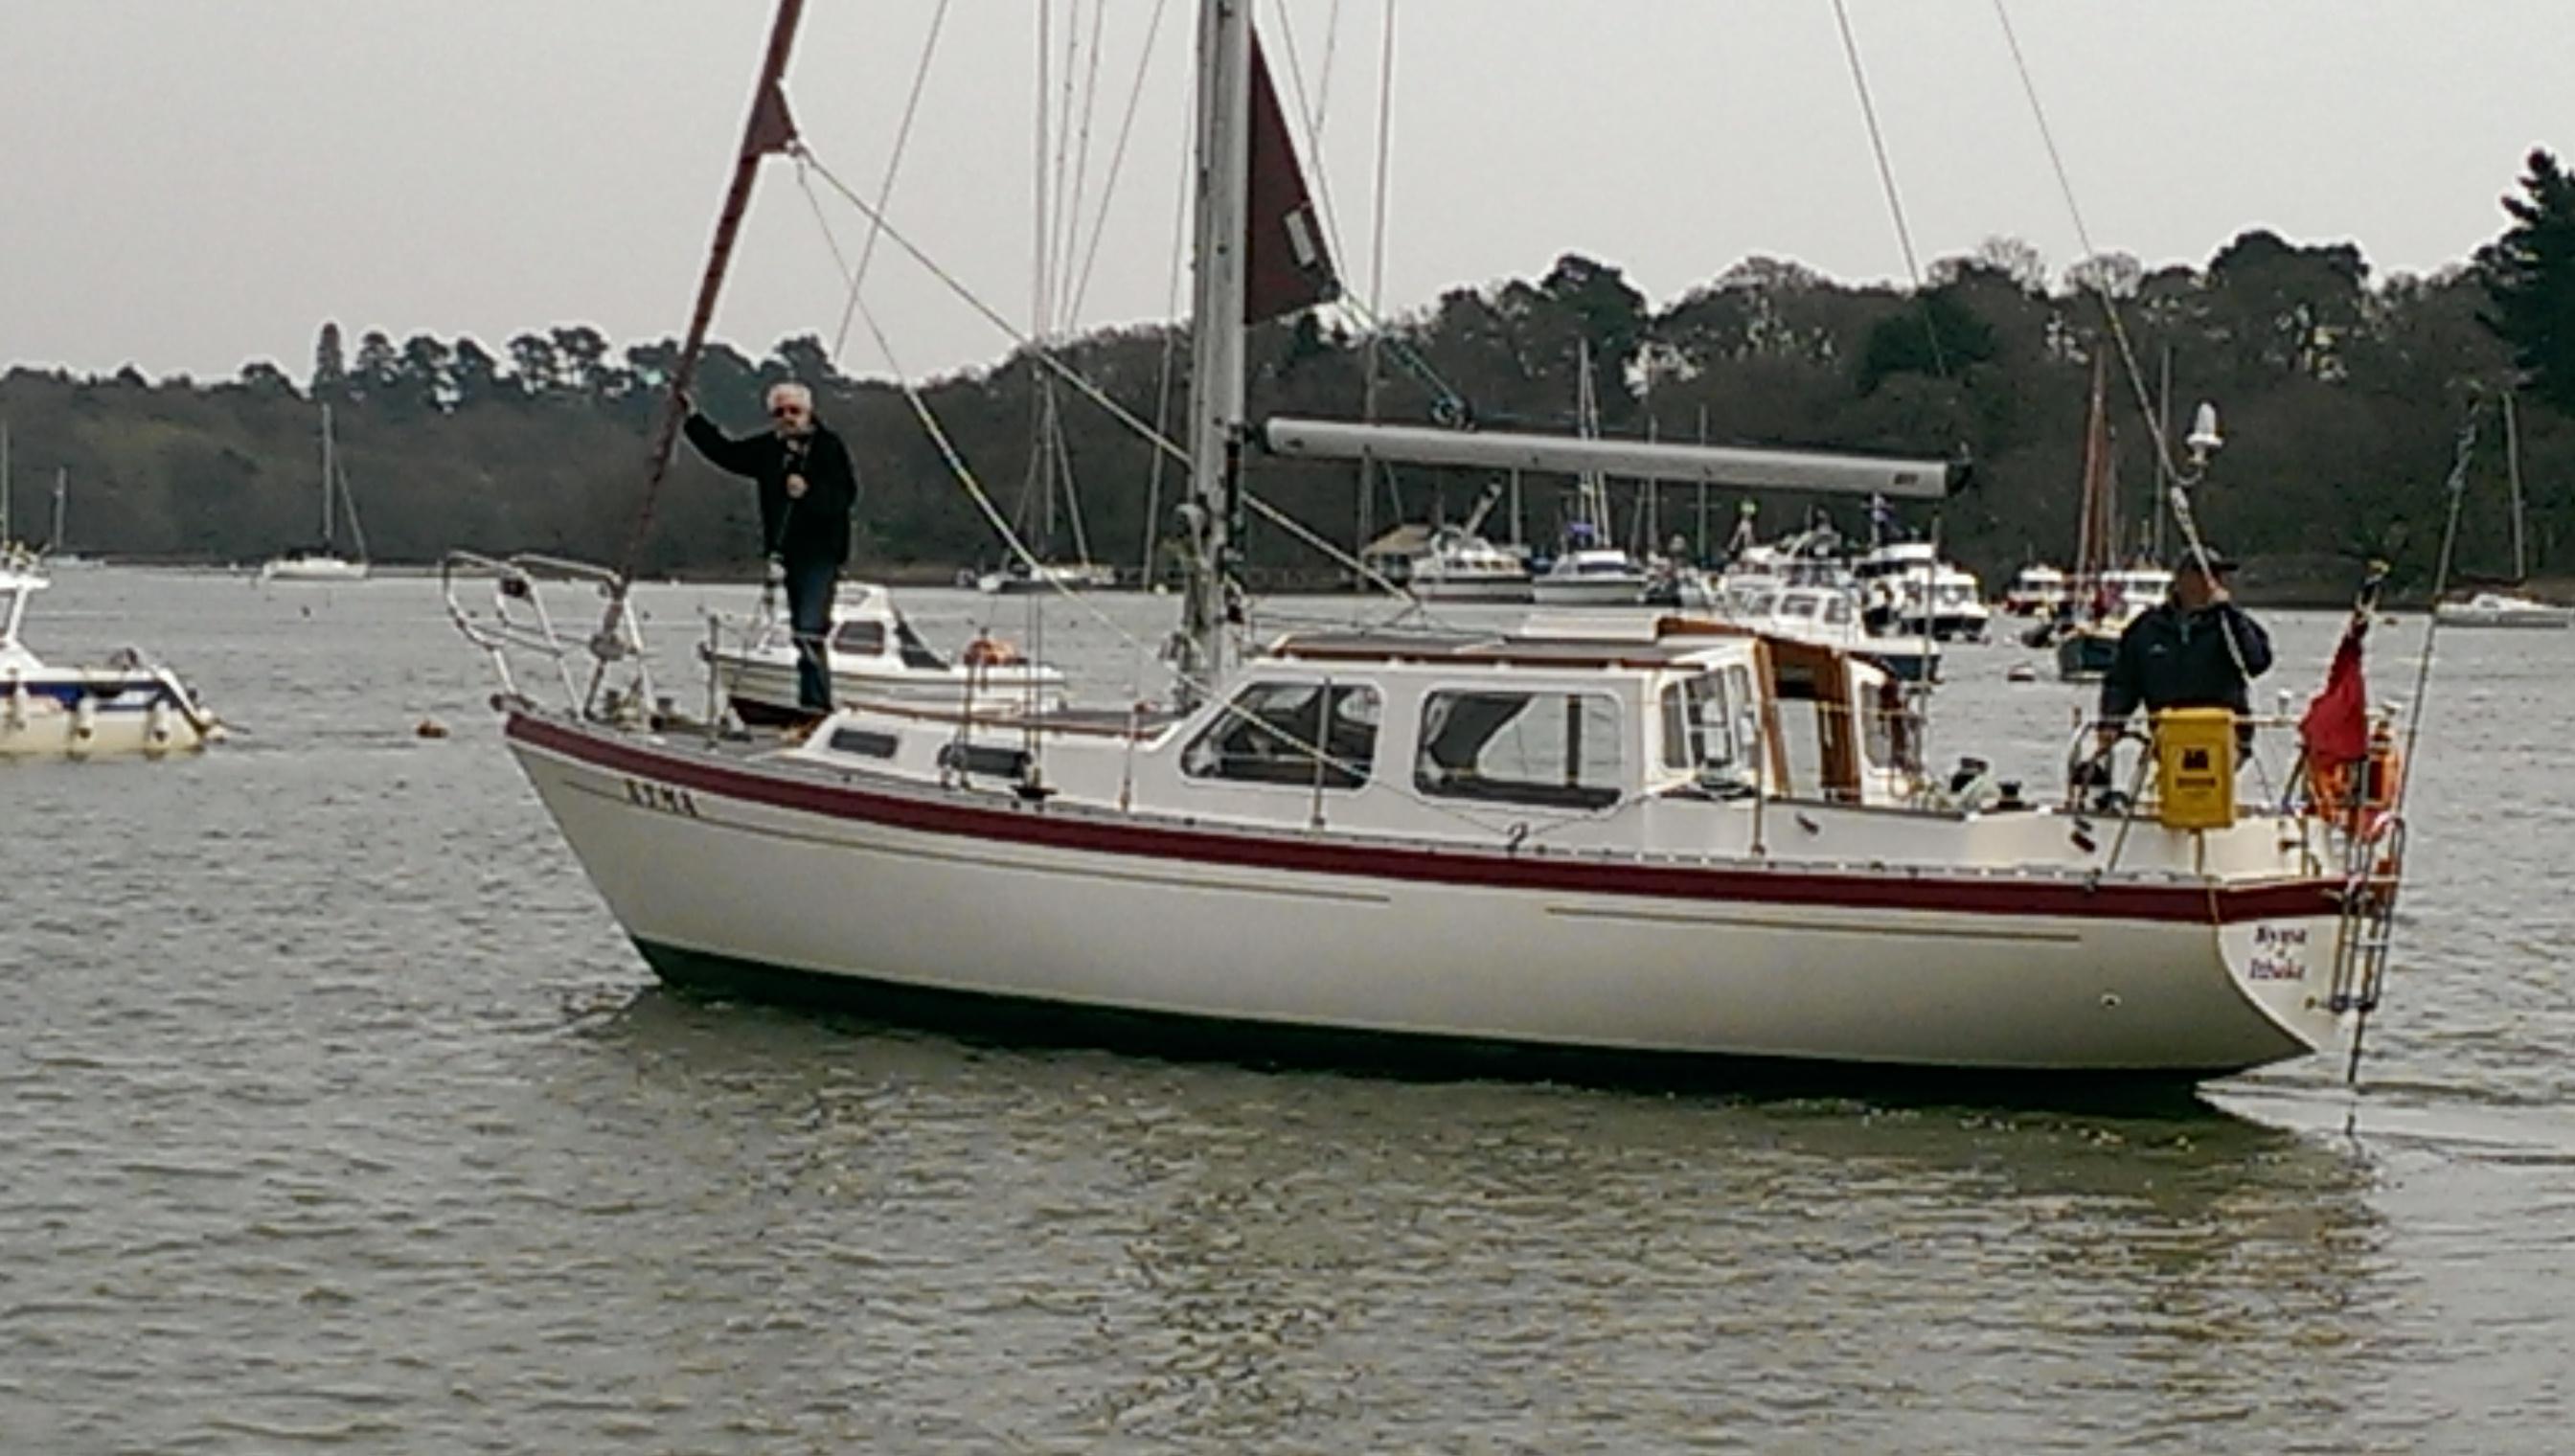 Trident Voyager 35, Beaulieu River